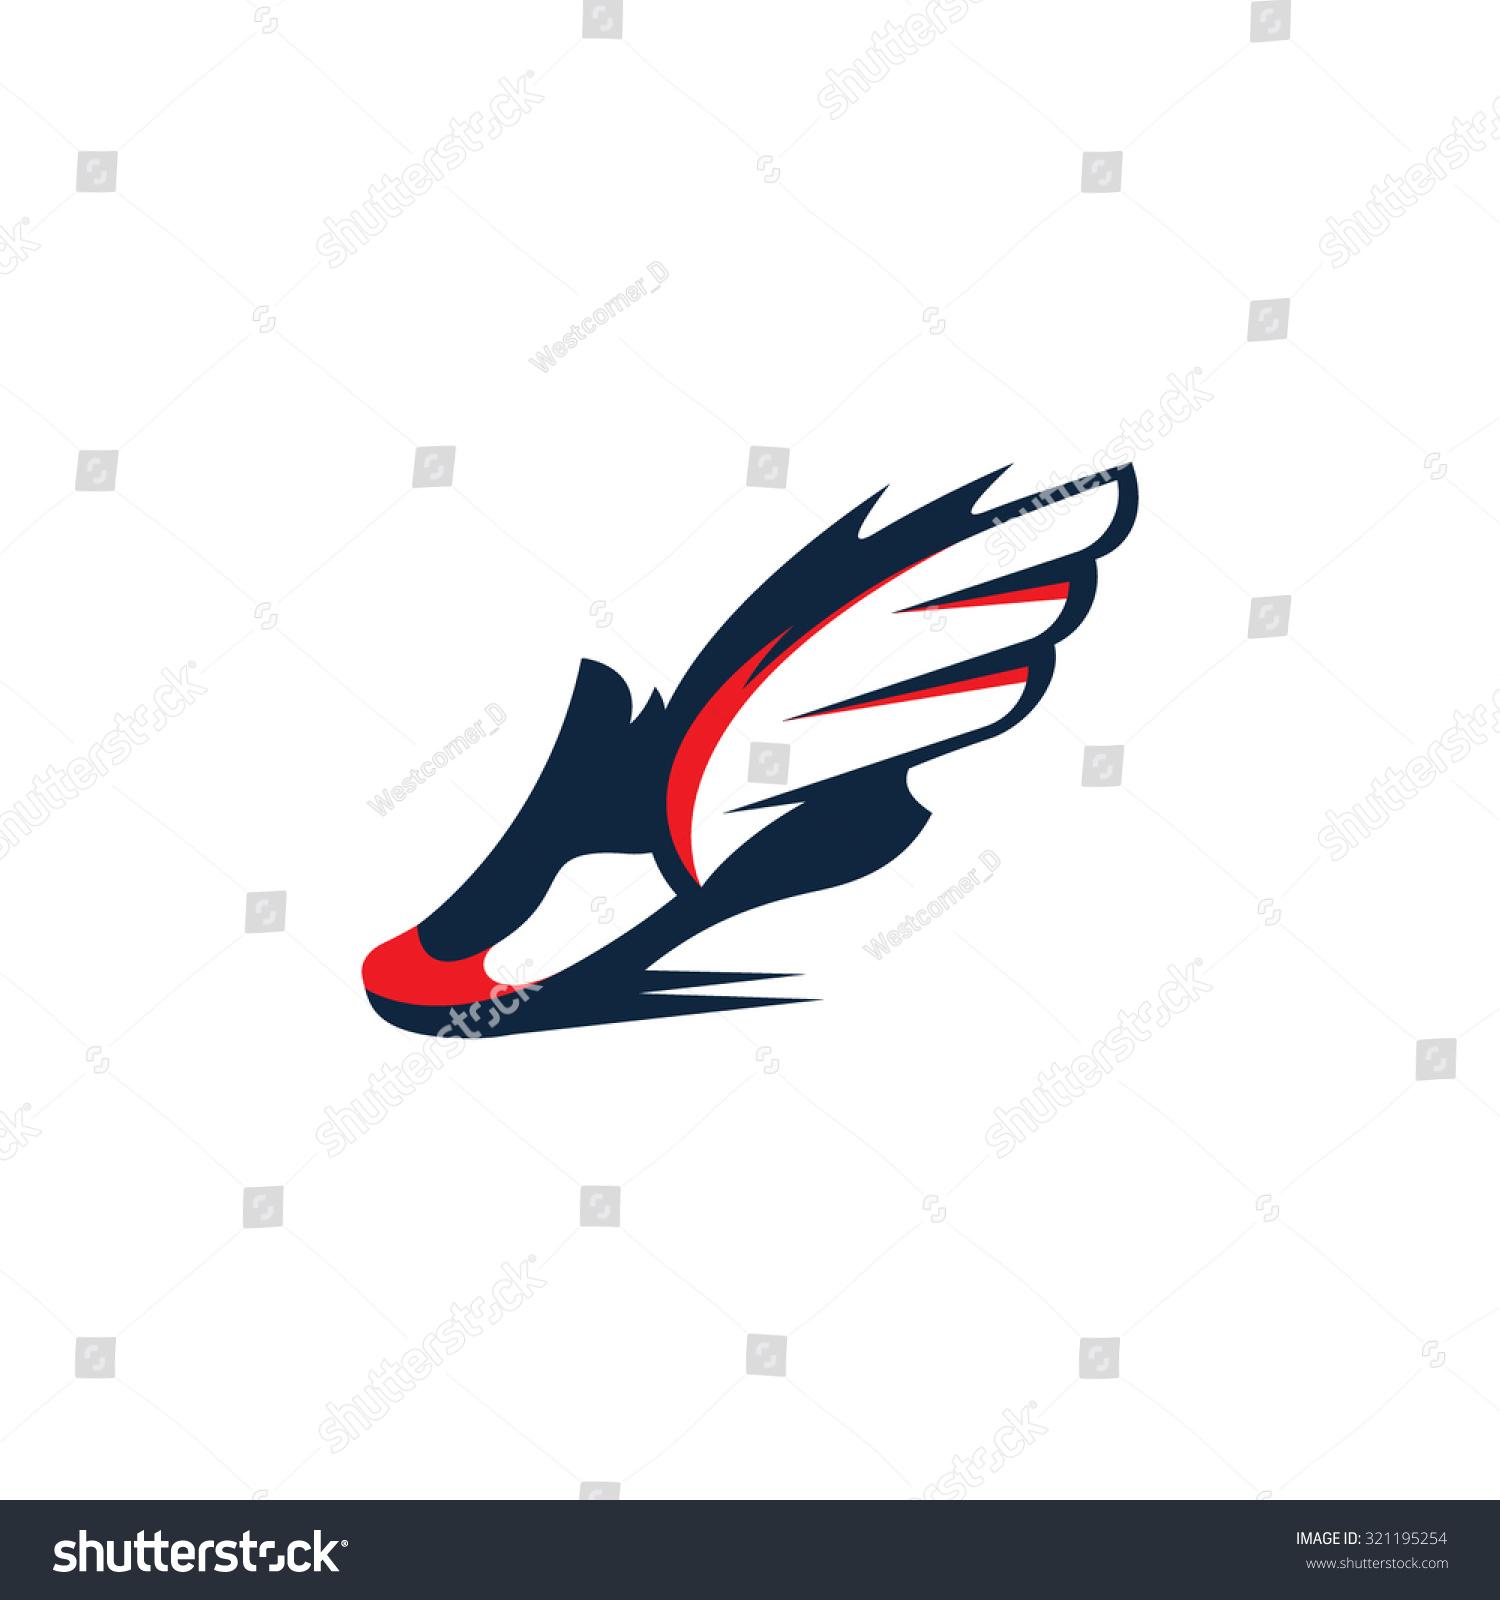 Sports shoes logos